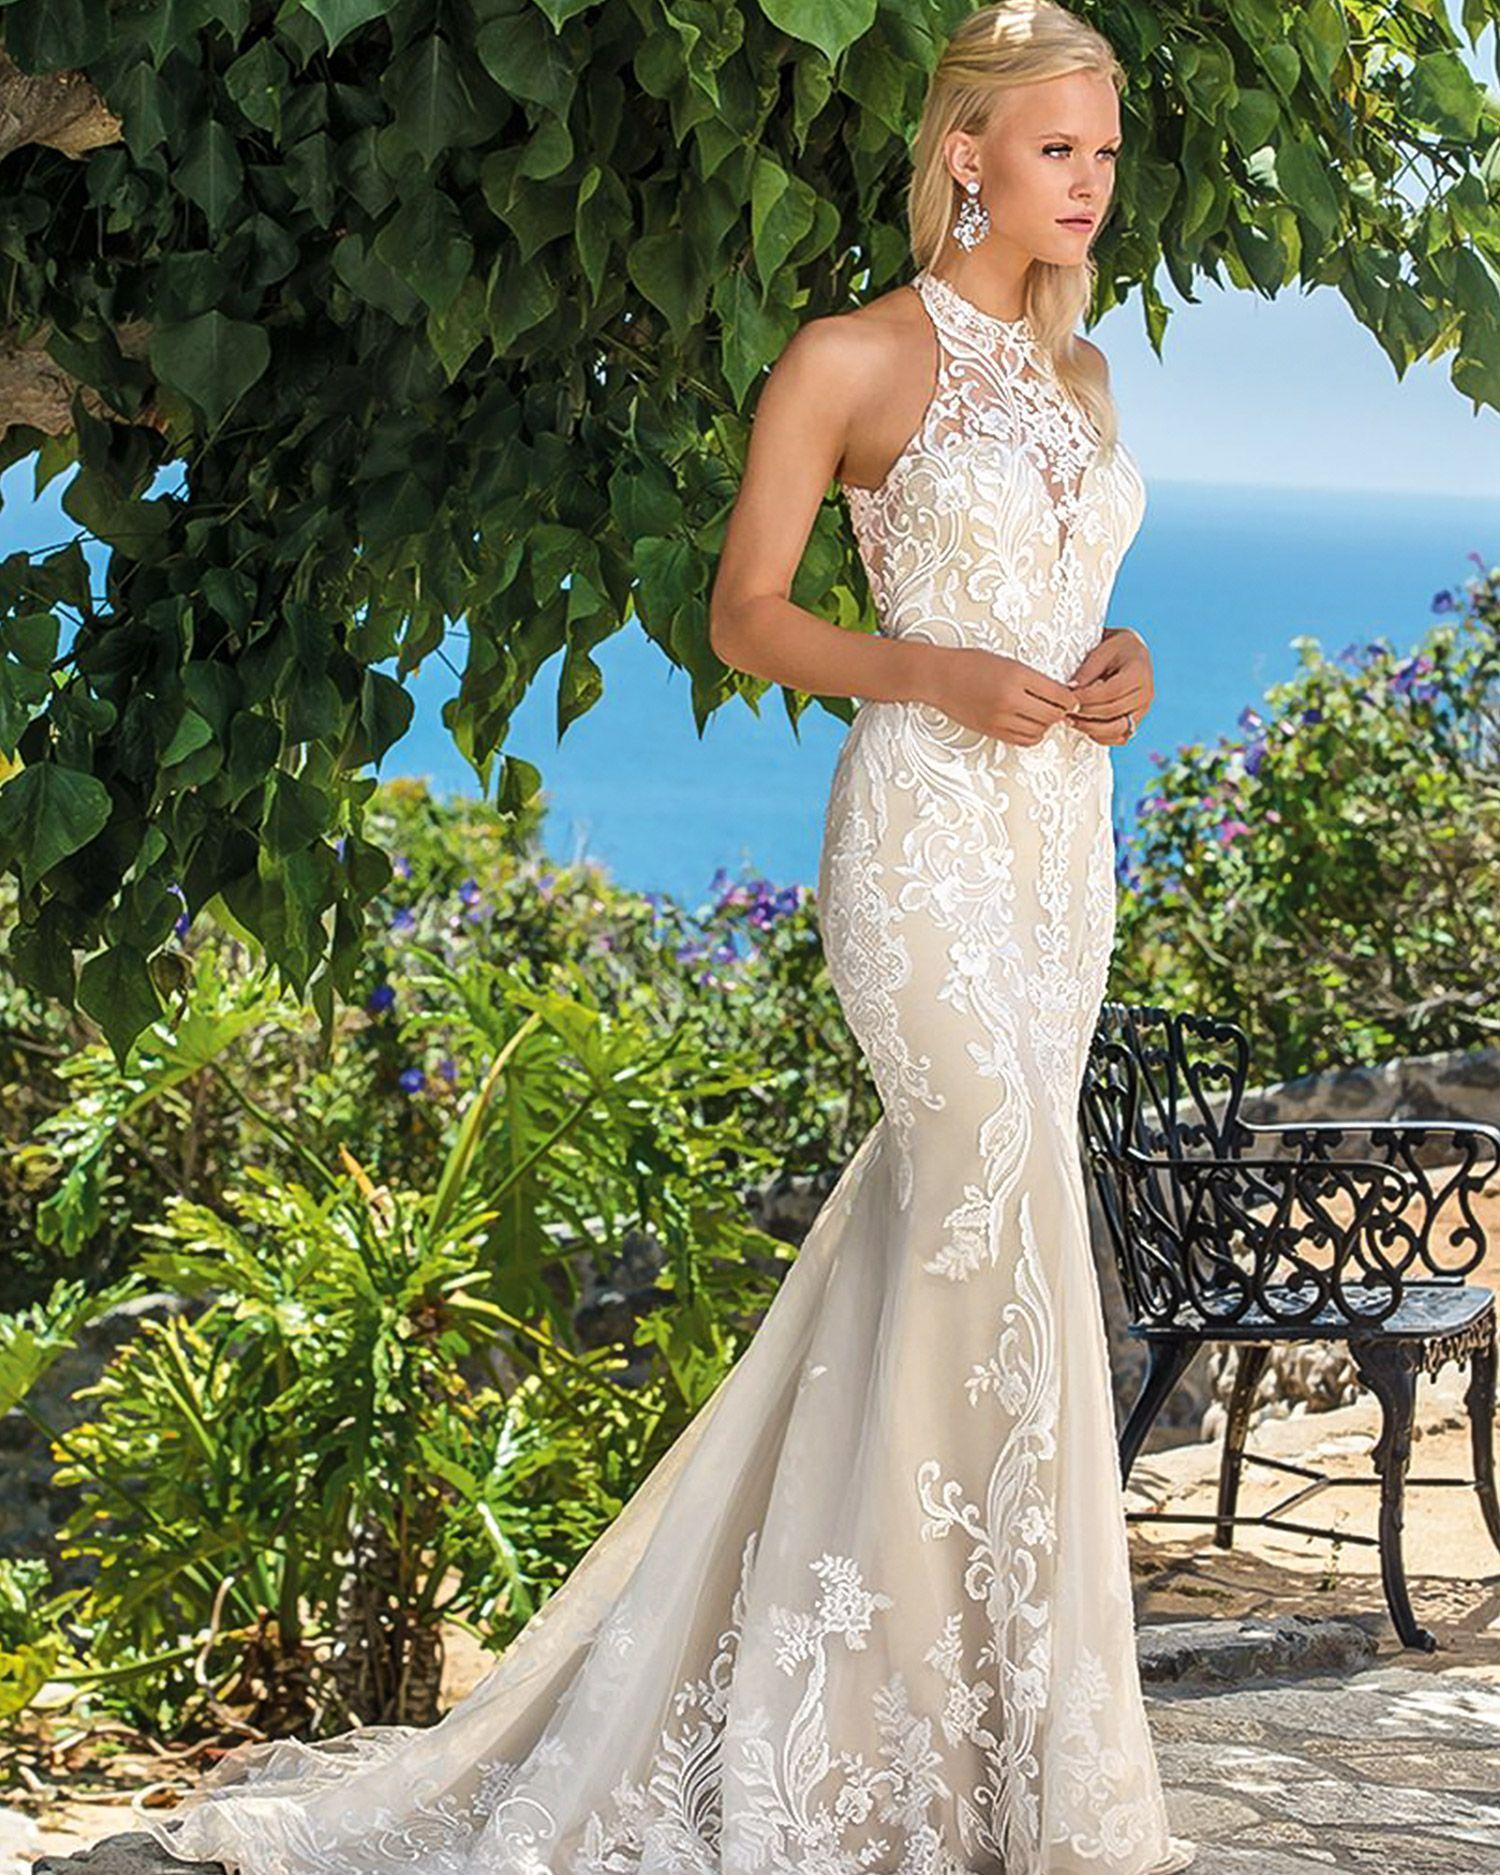 Ad Casablanca Bridal wedding dress JOSEPHINE.This